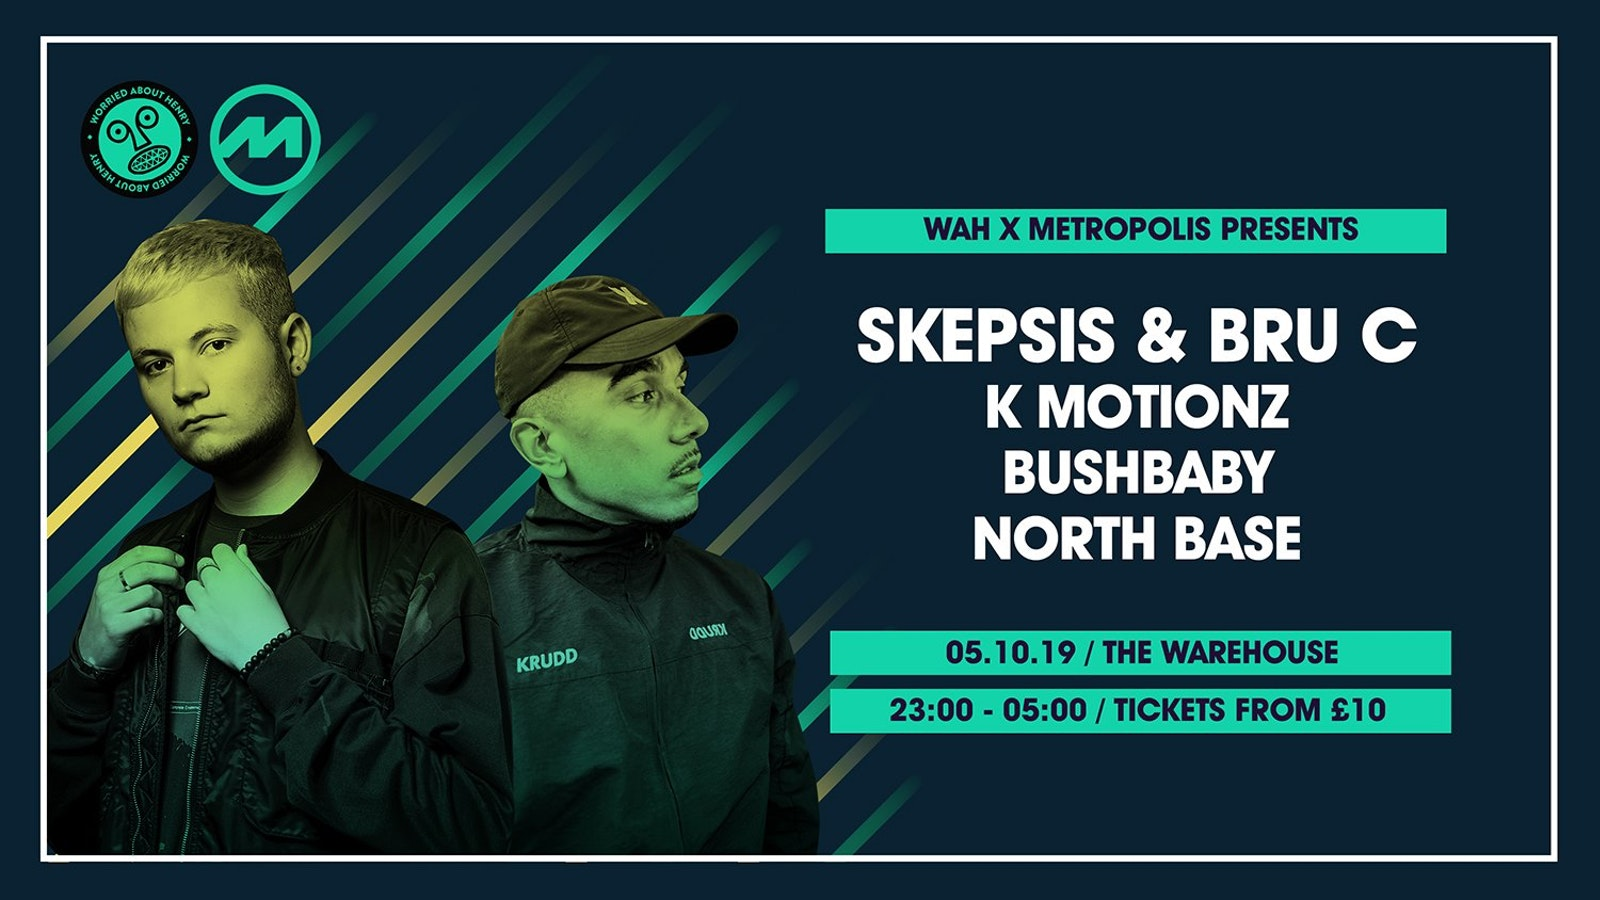 Skepsis & Bru-C, K Motionz, Bushbaby – The Warehouse Leeds